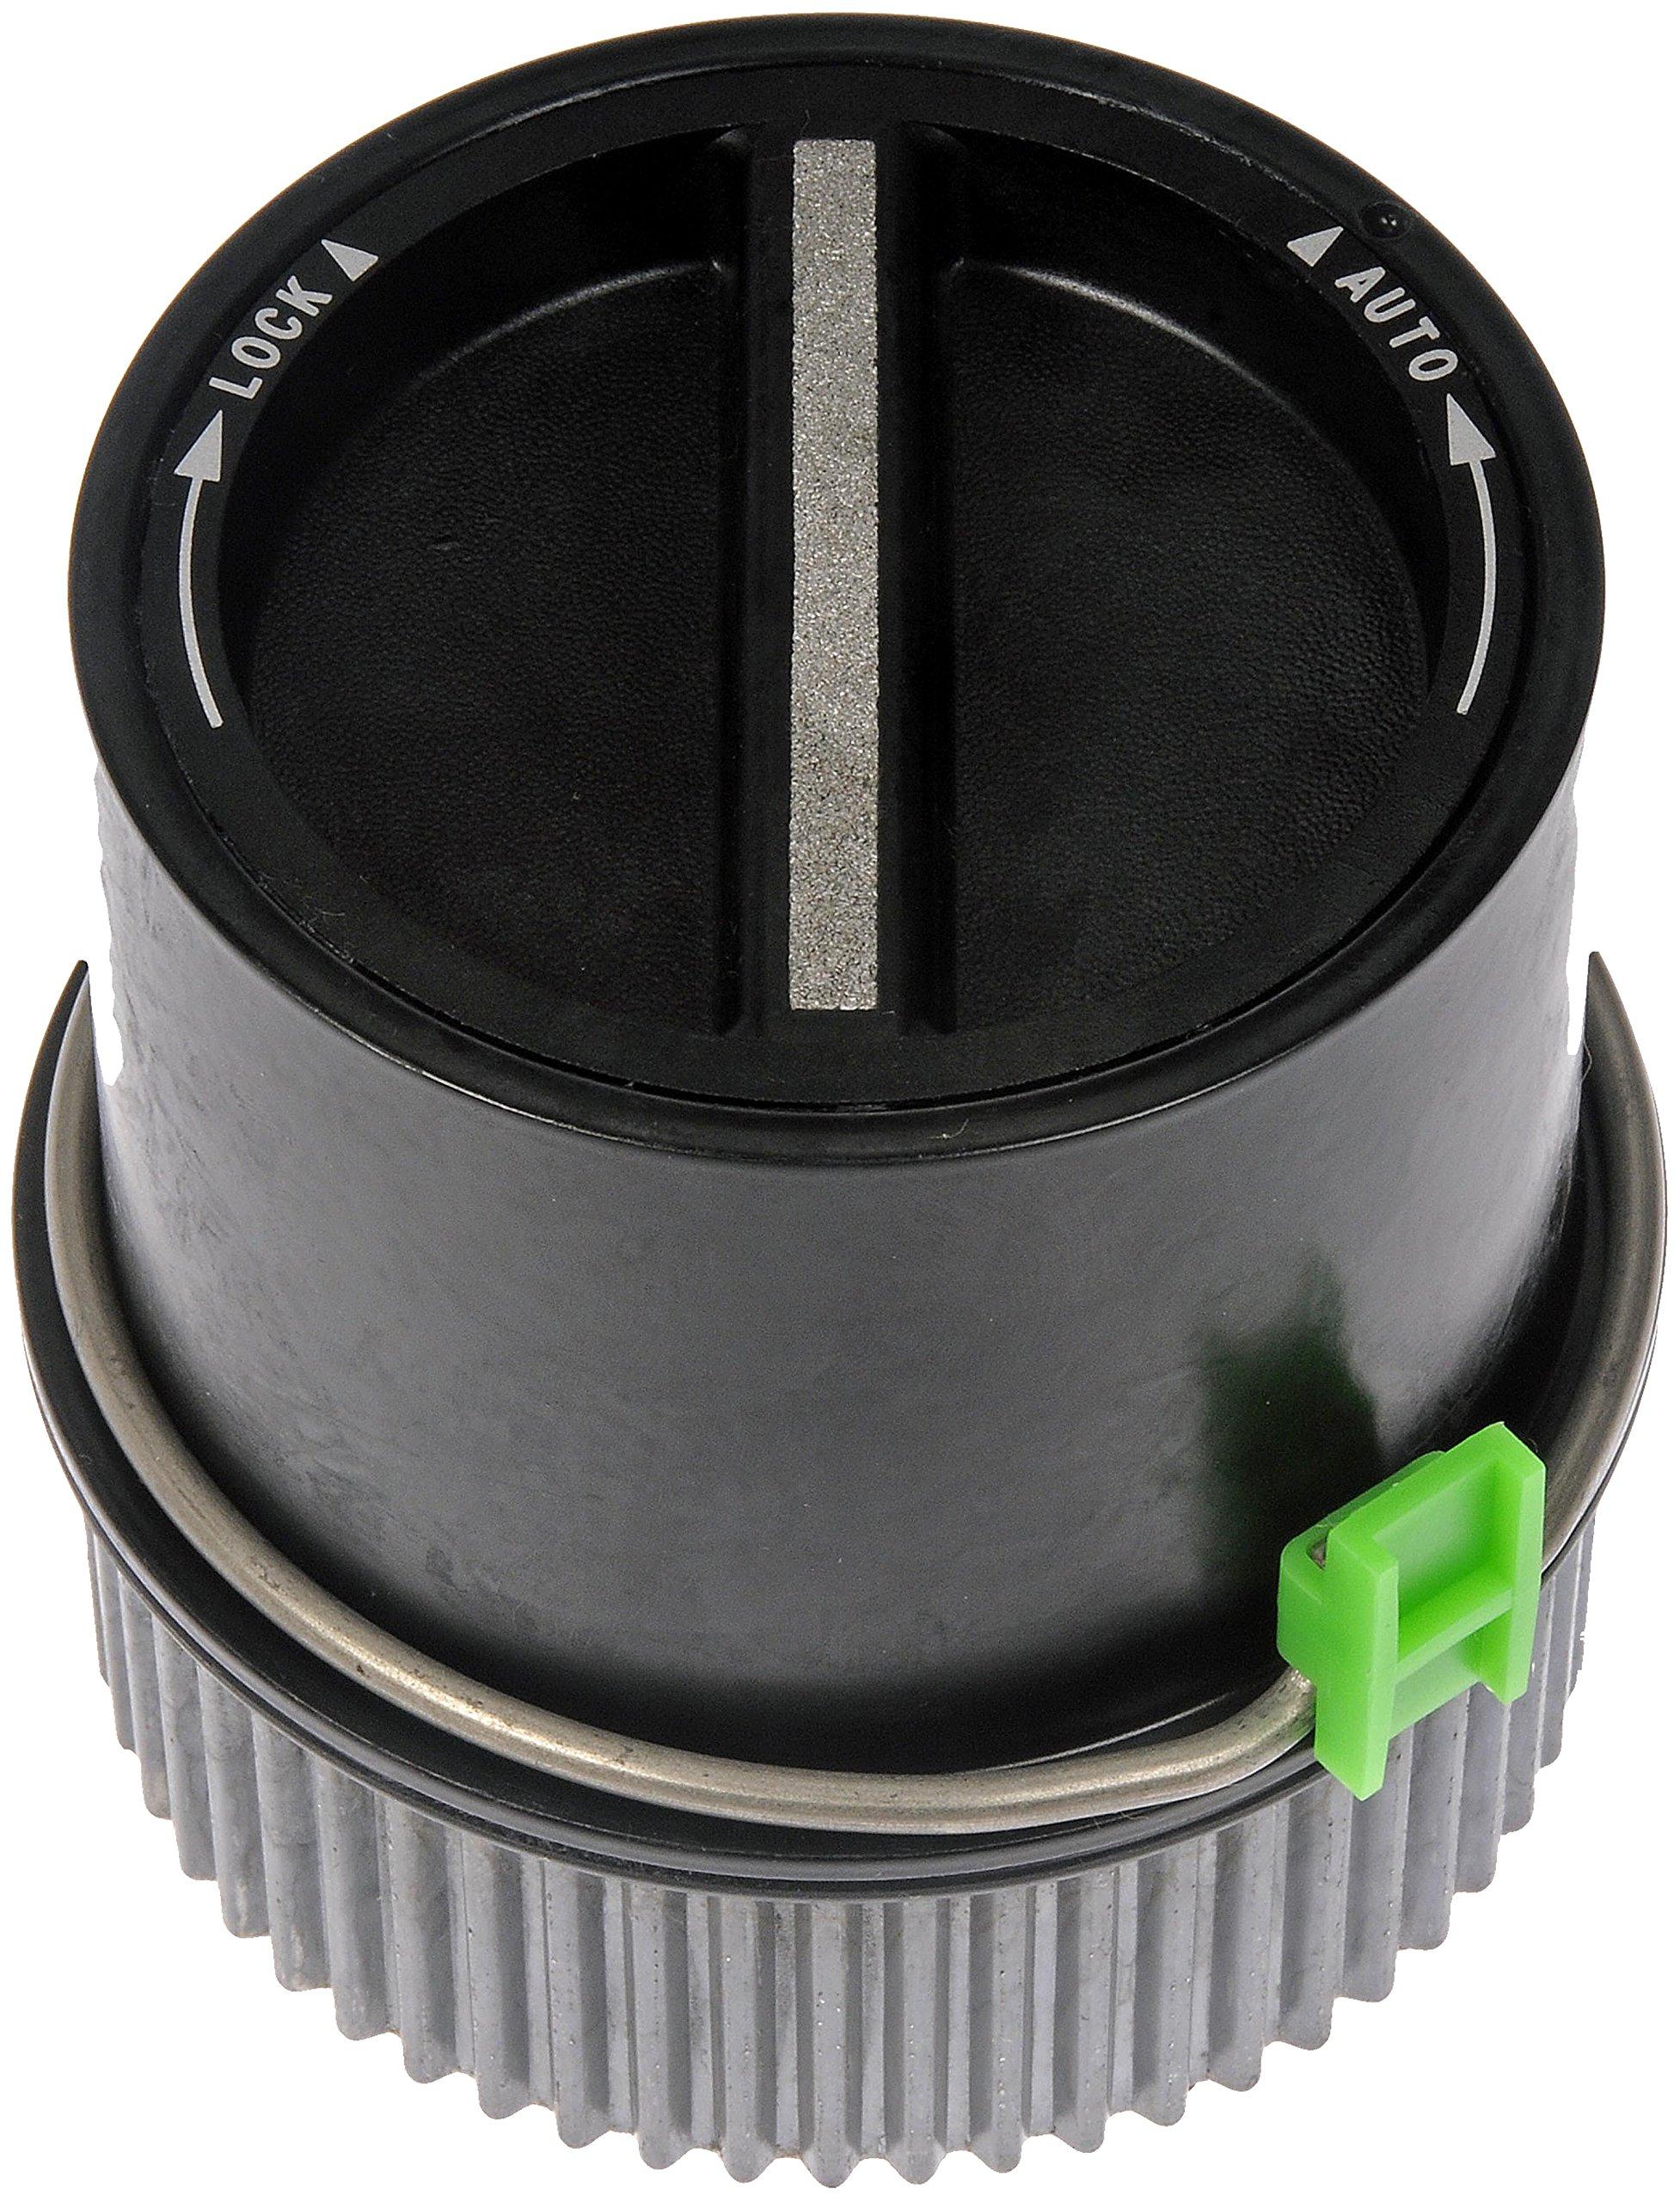 Dorman 600-203 4WD Auto Locking Hub